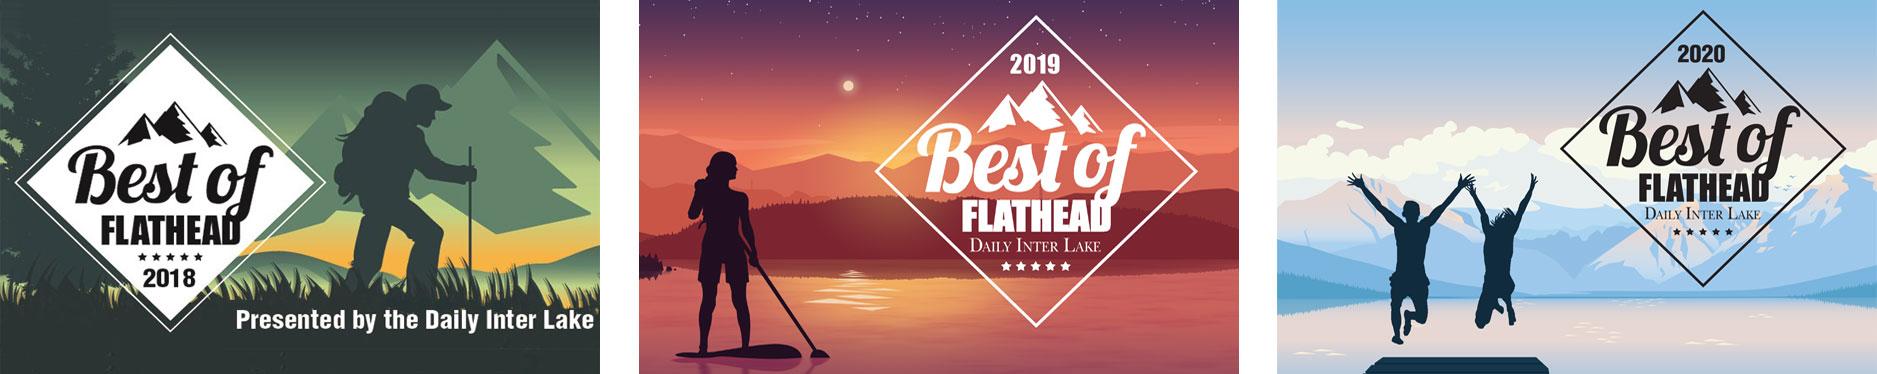 Best of Flathead Best HVAC Company Award